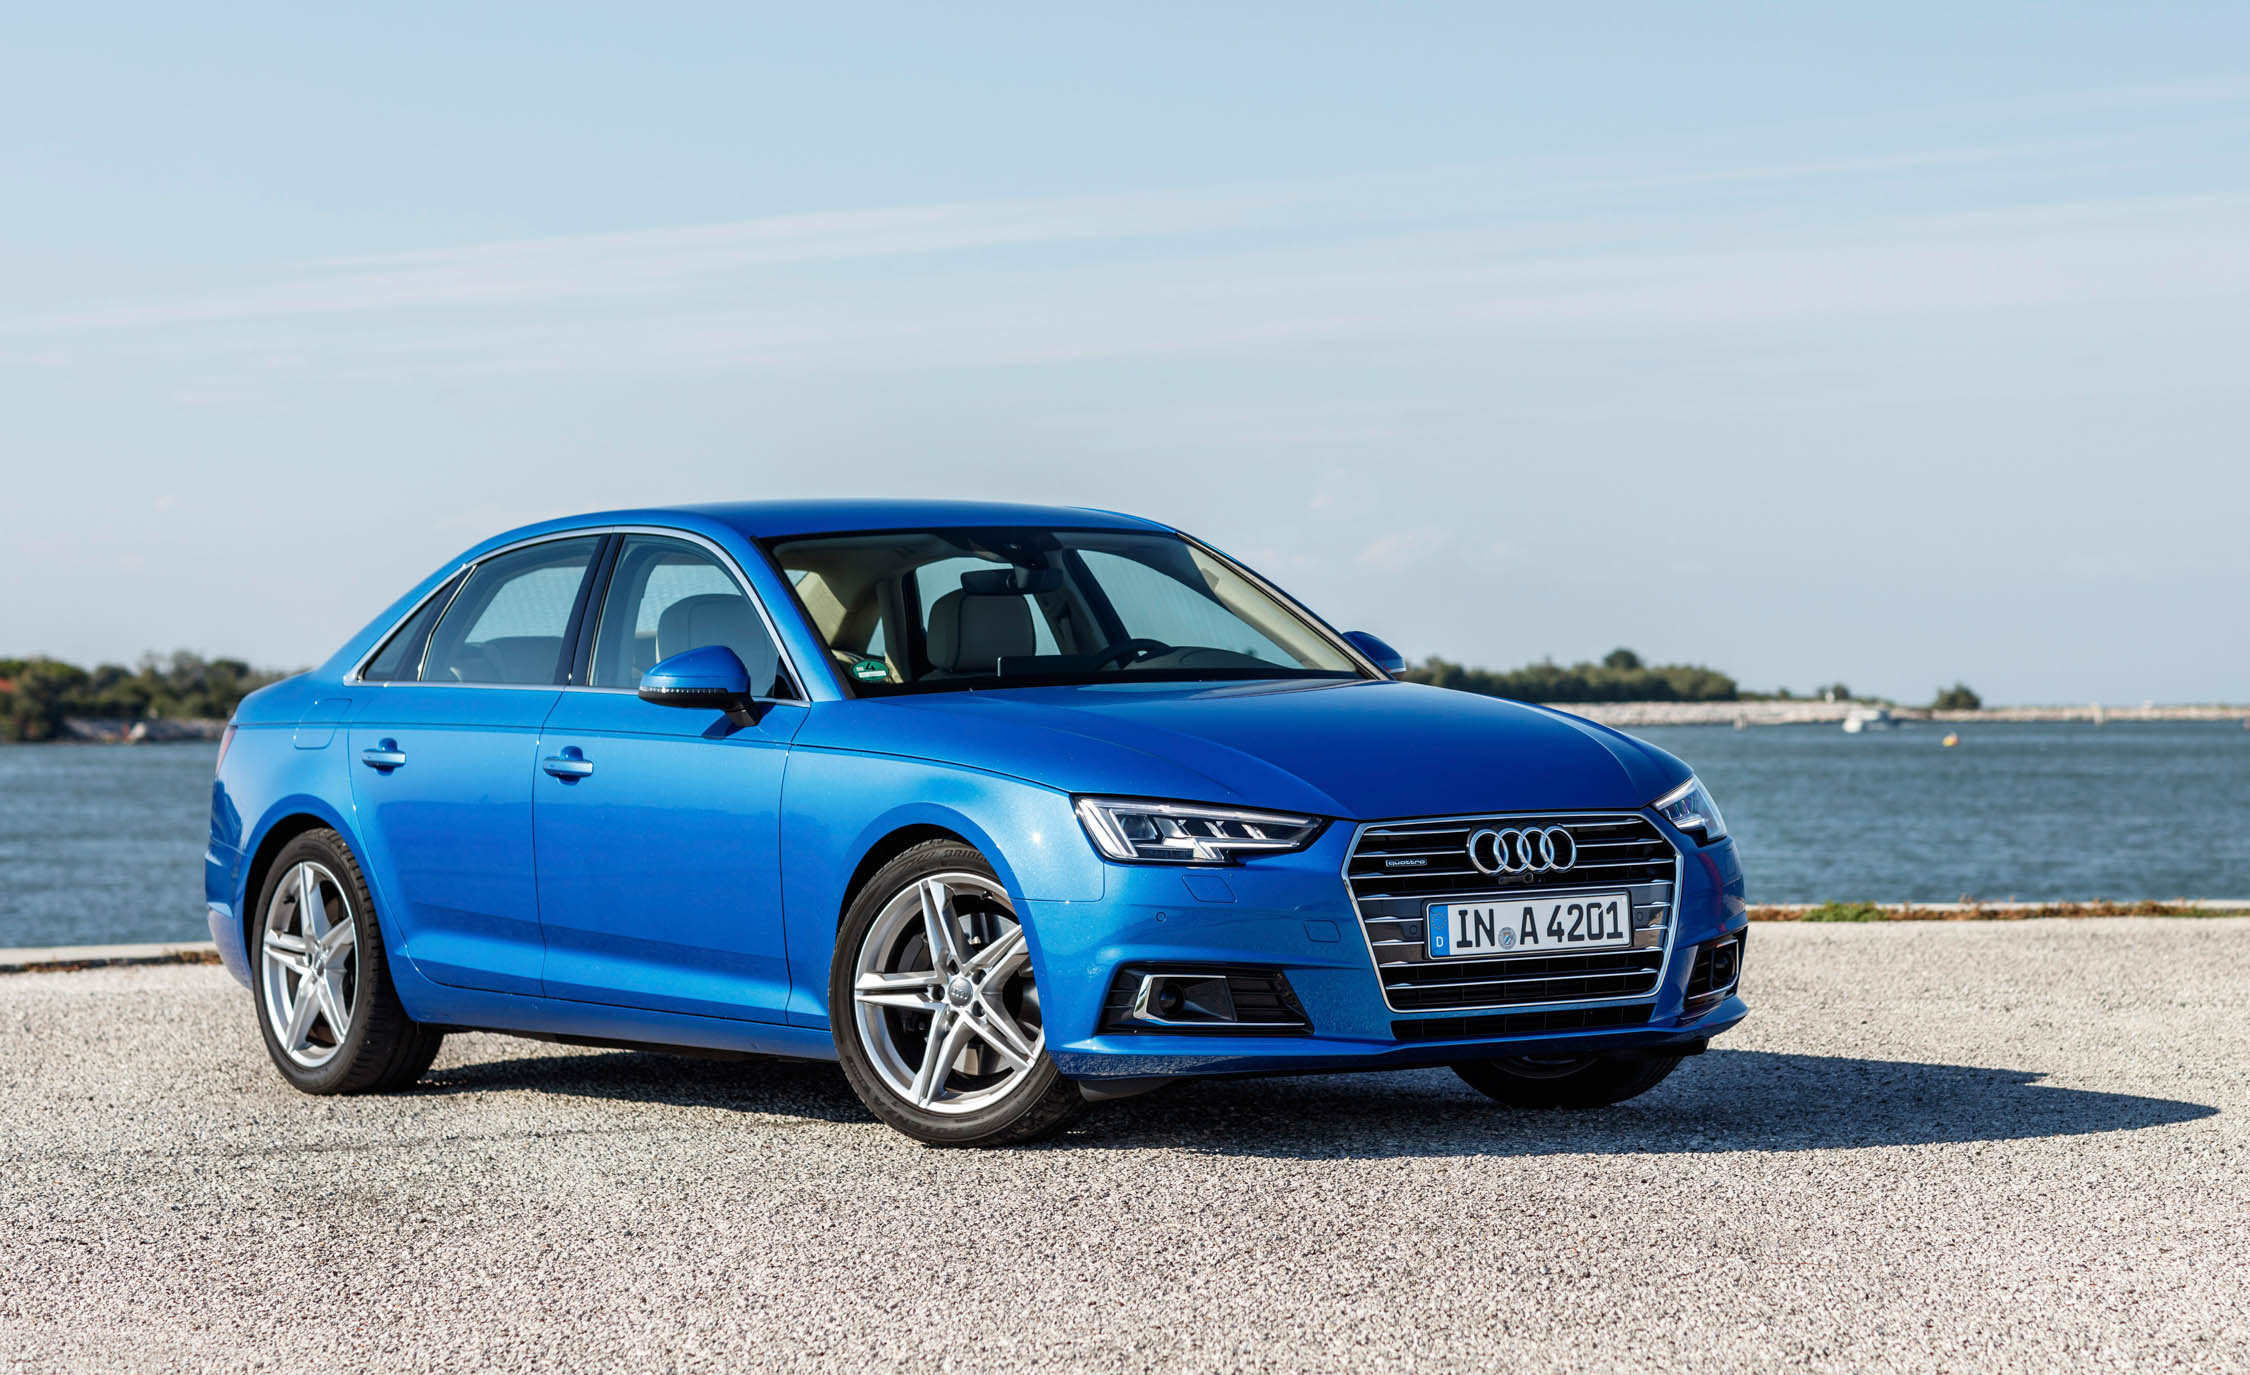 Sorta A4ordable: All-New 2017 Audi A4 Still Starts Under $40,000 3